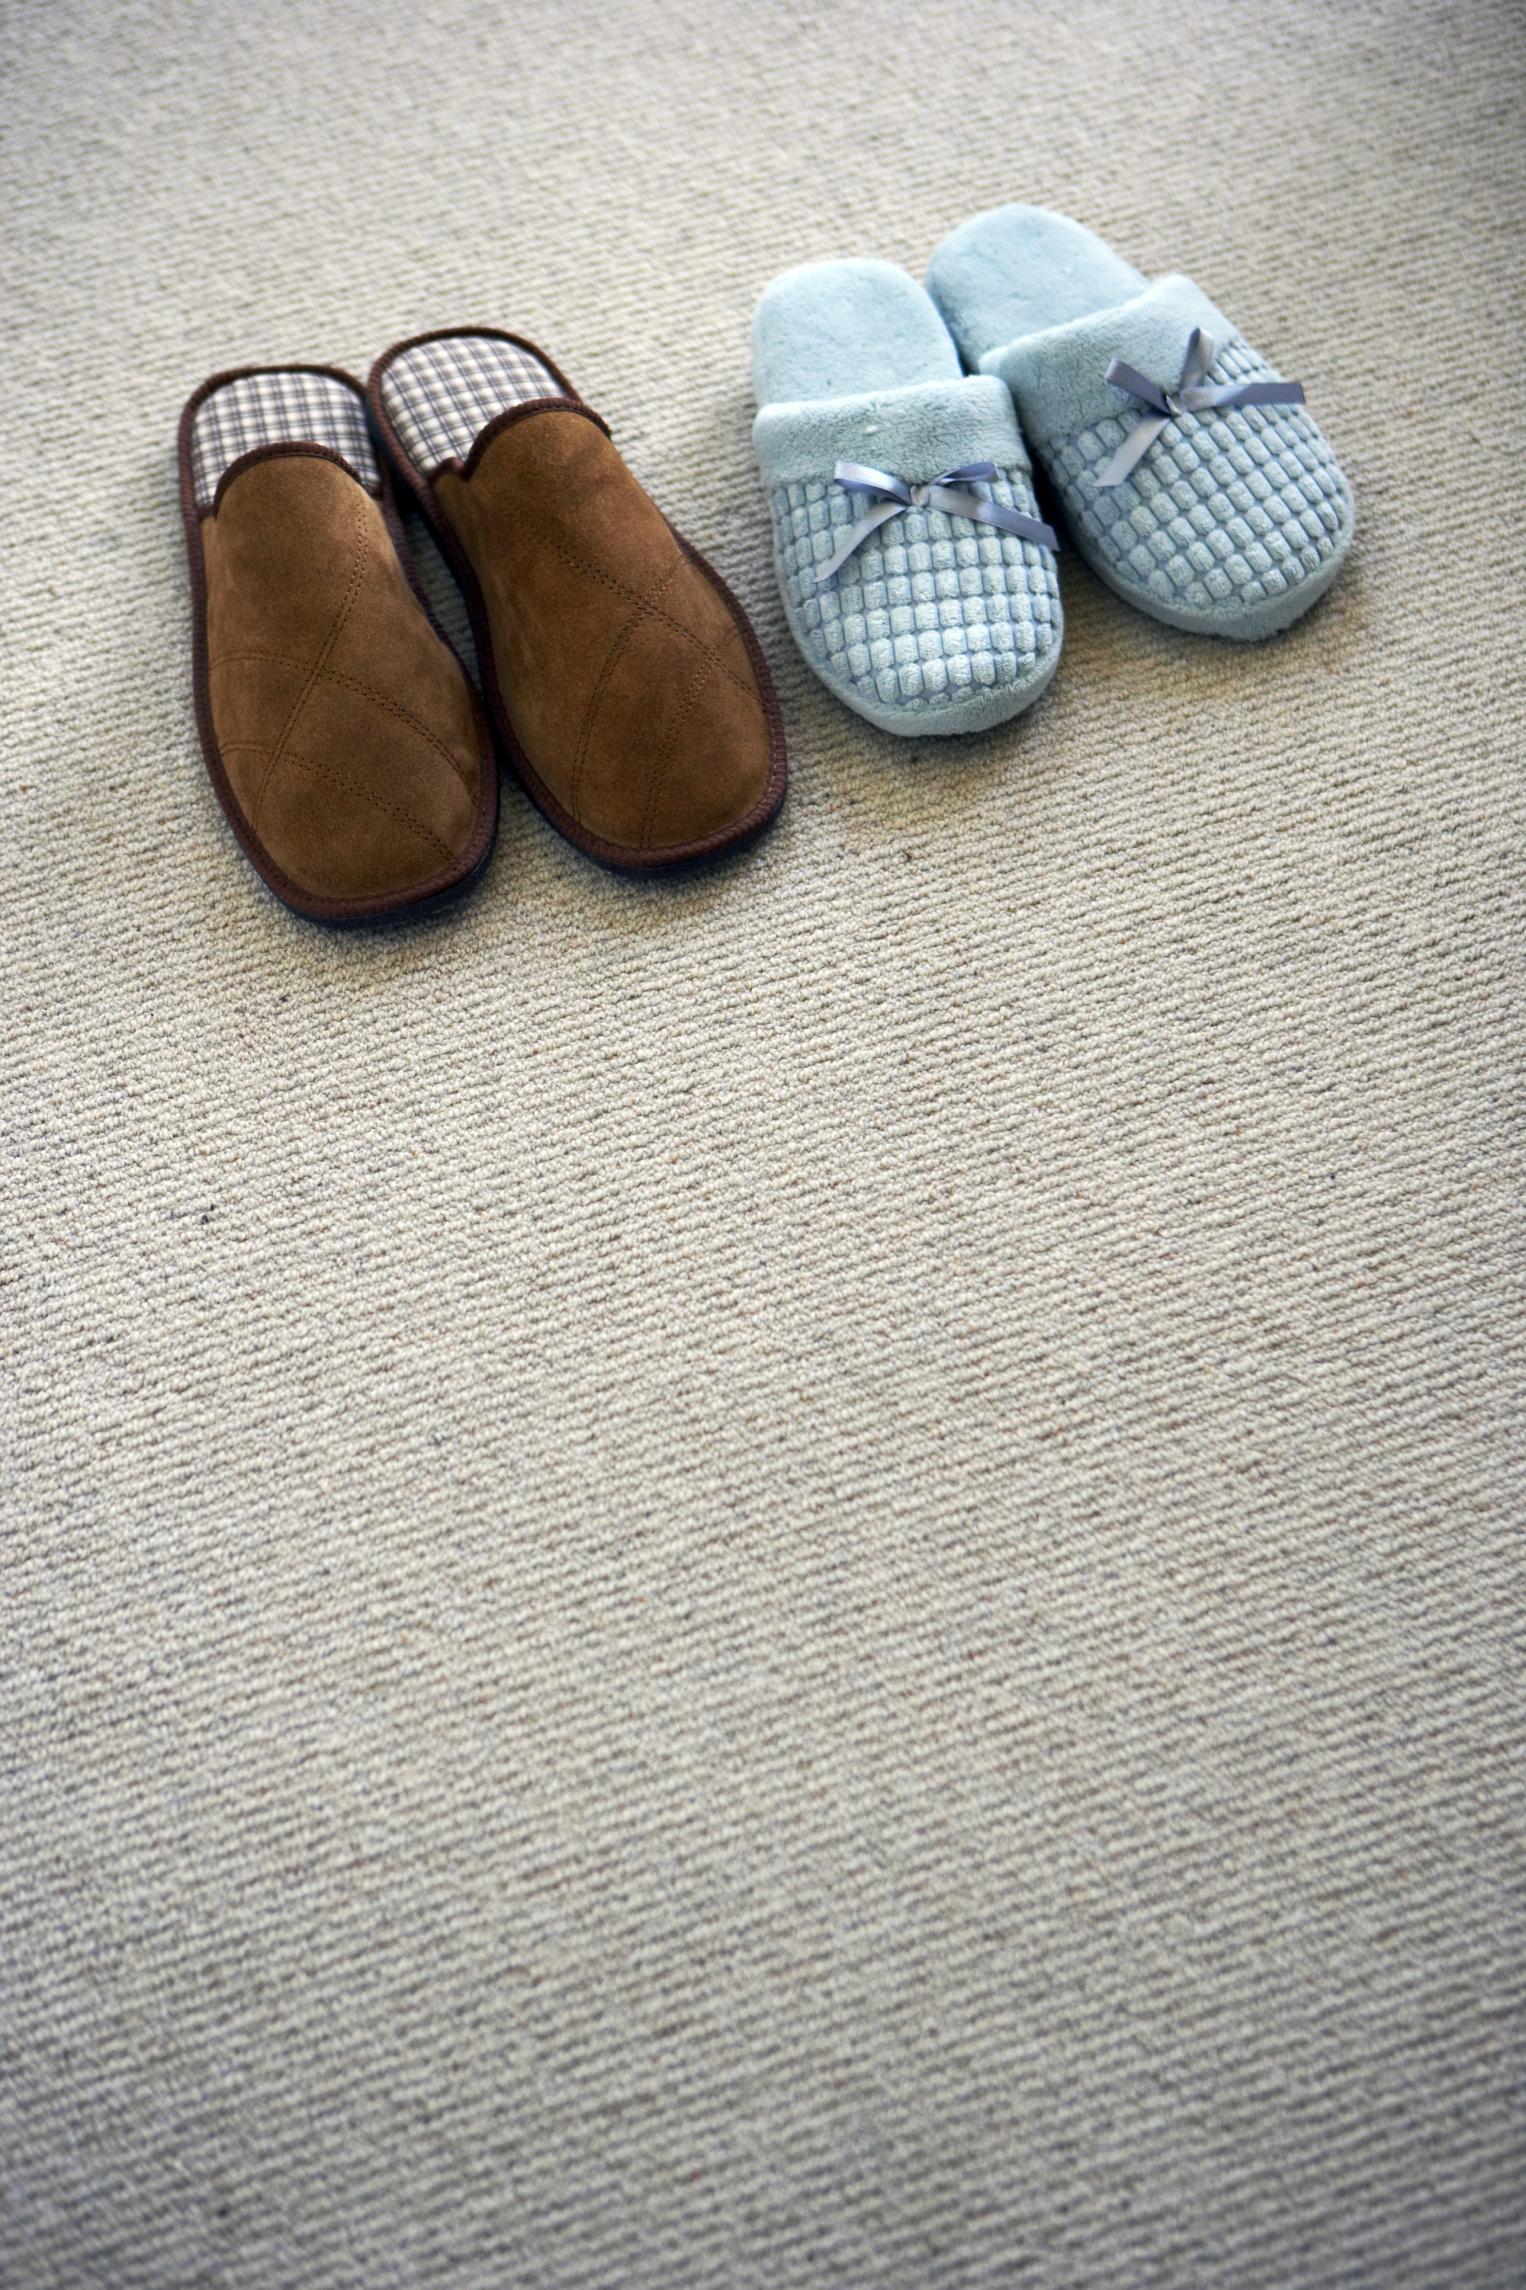 Normal Wear And Tear Carpet Security Deposit Carpet